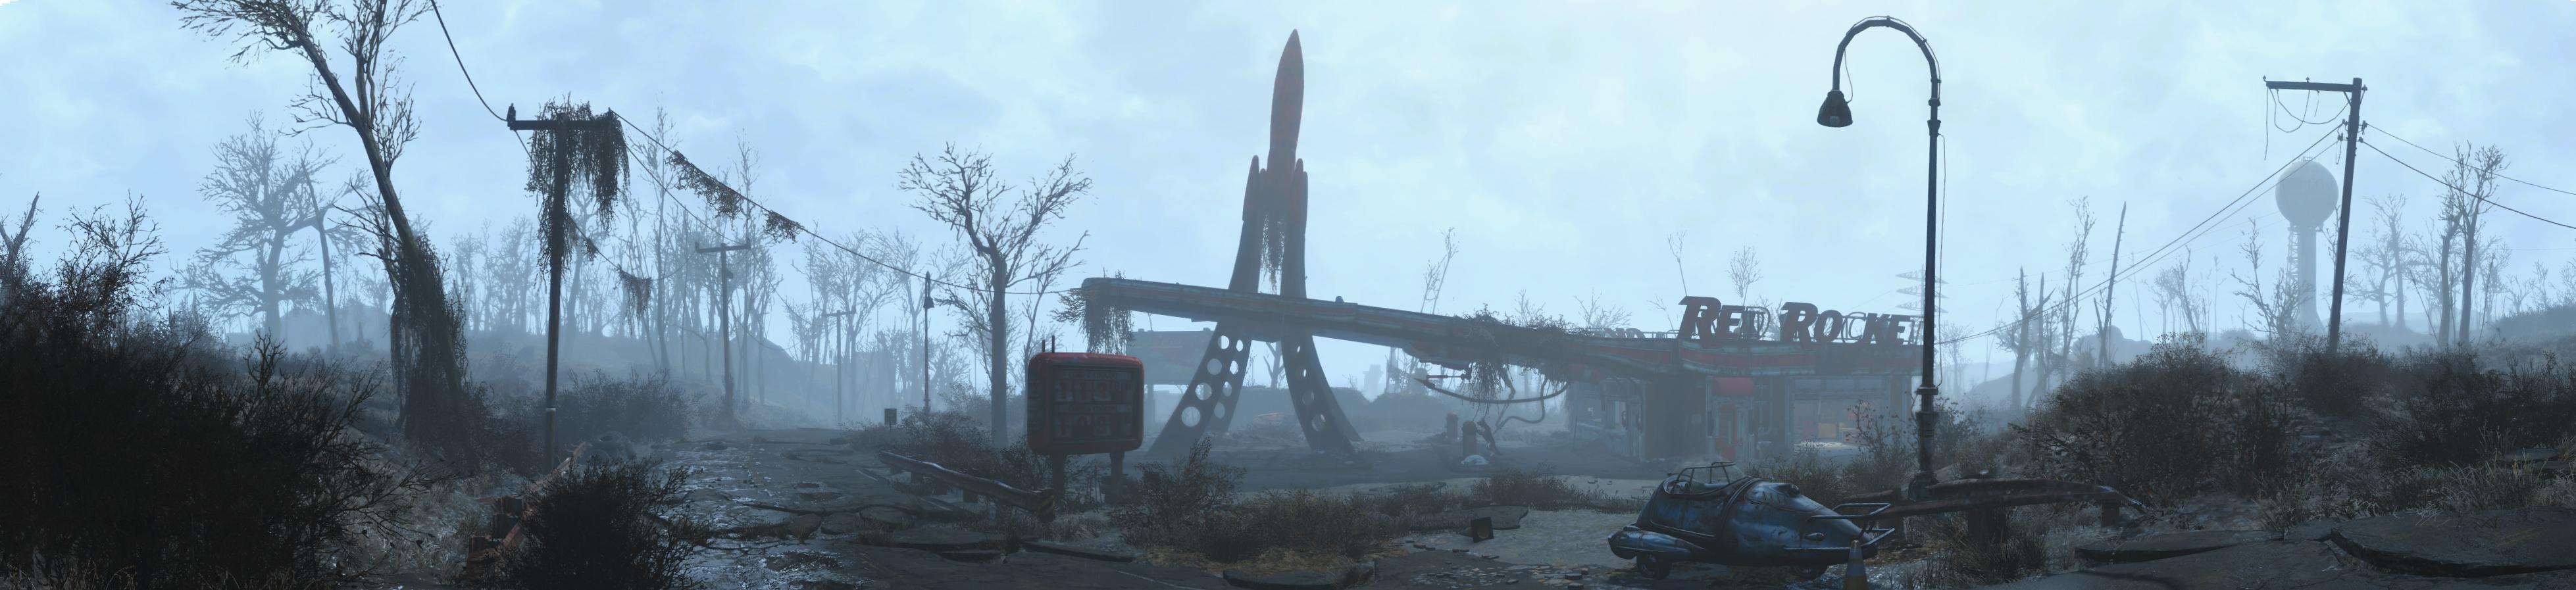 Fallout 4 v launch traileru 115940